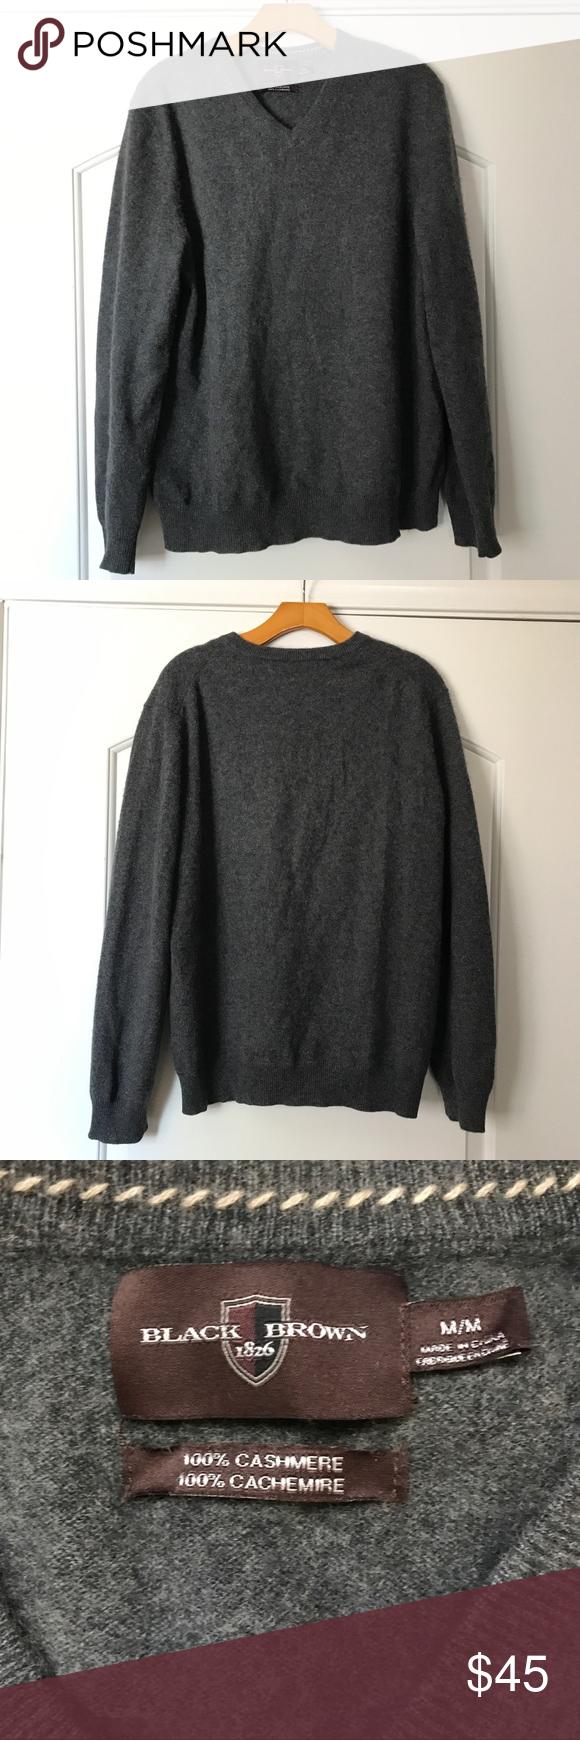 Black Brown 1826 Gray Cashmere V Neck Sweater | Soft fabrics ...